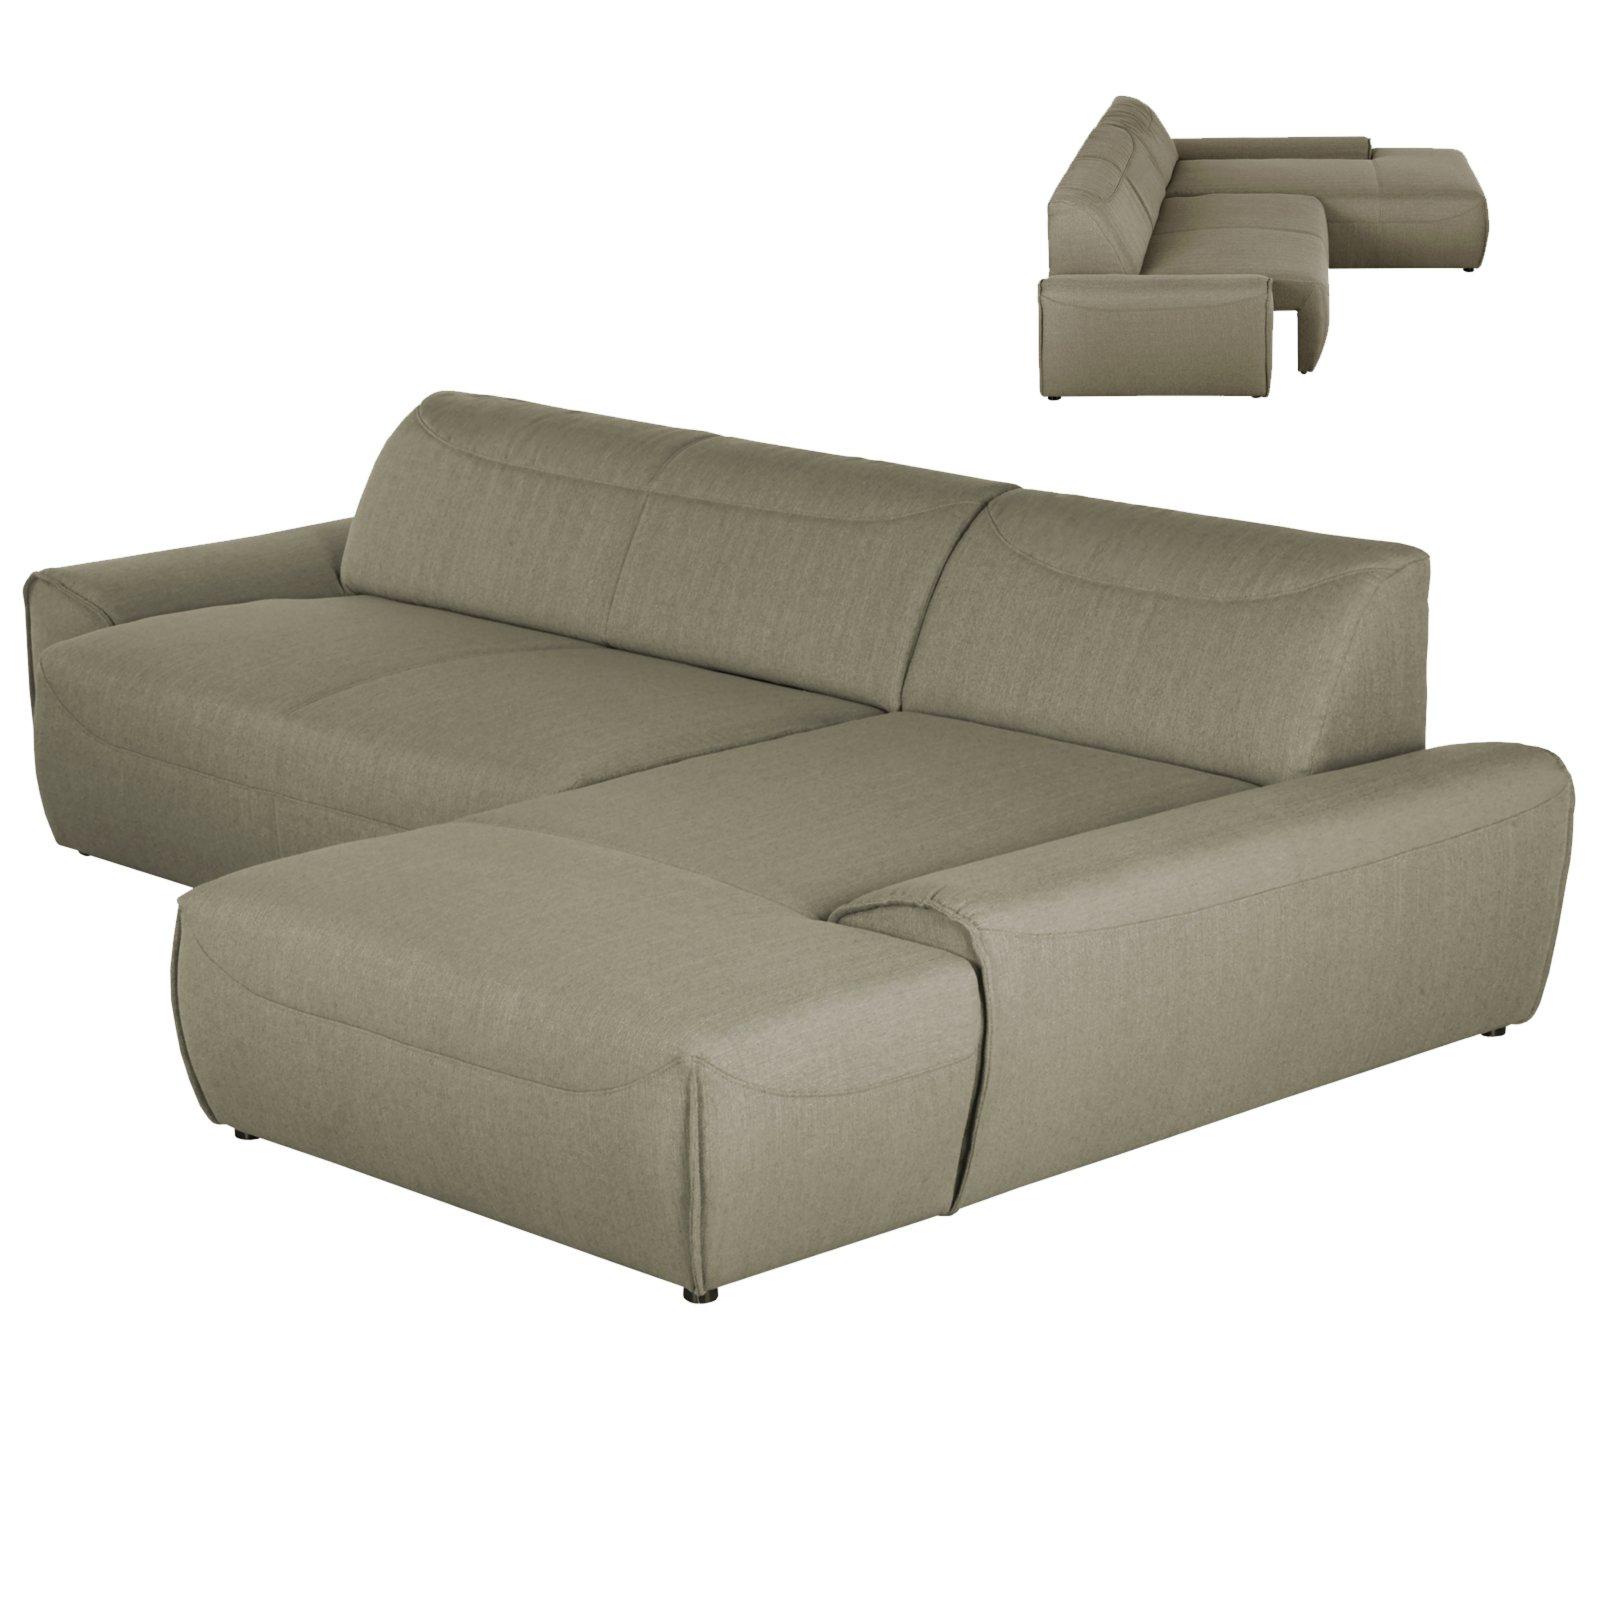 ecksofa stein sitzauszug links ecksofas l form sofas couches m bel roller. Black Bedroom Furniture Sets. Home Design Ideas